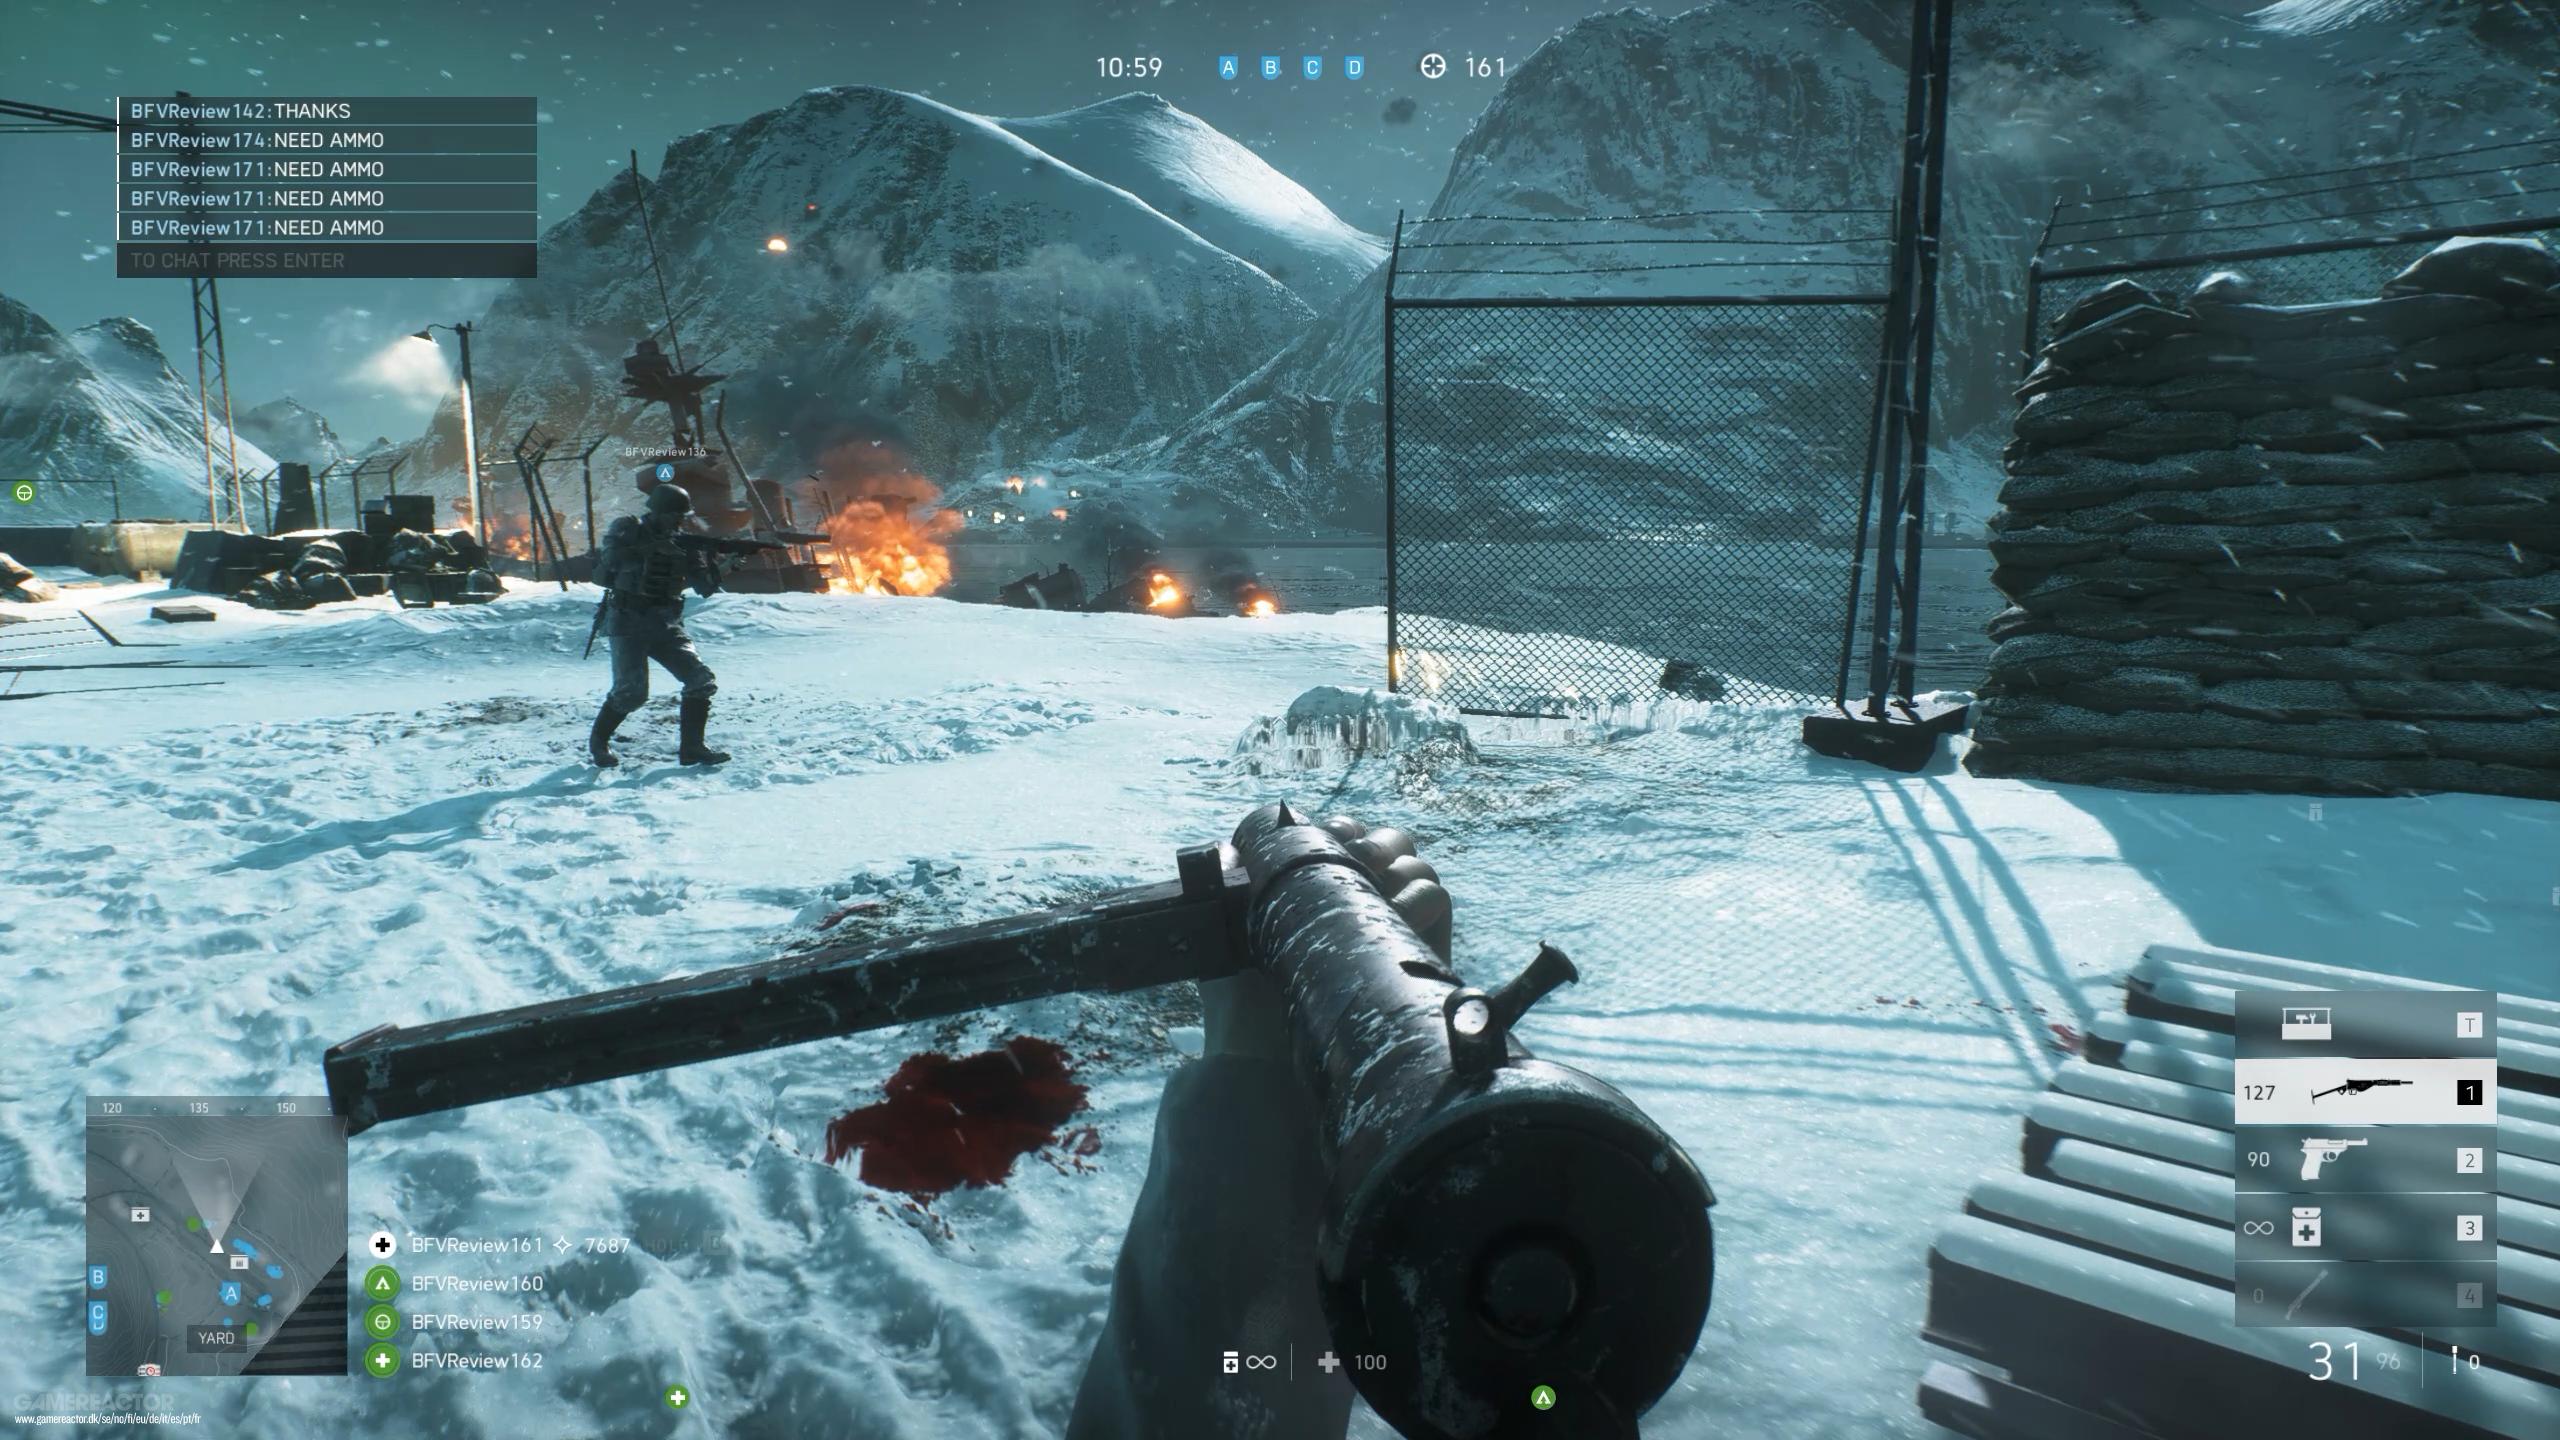 Bilder zu Battlefield V 2/8